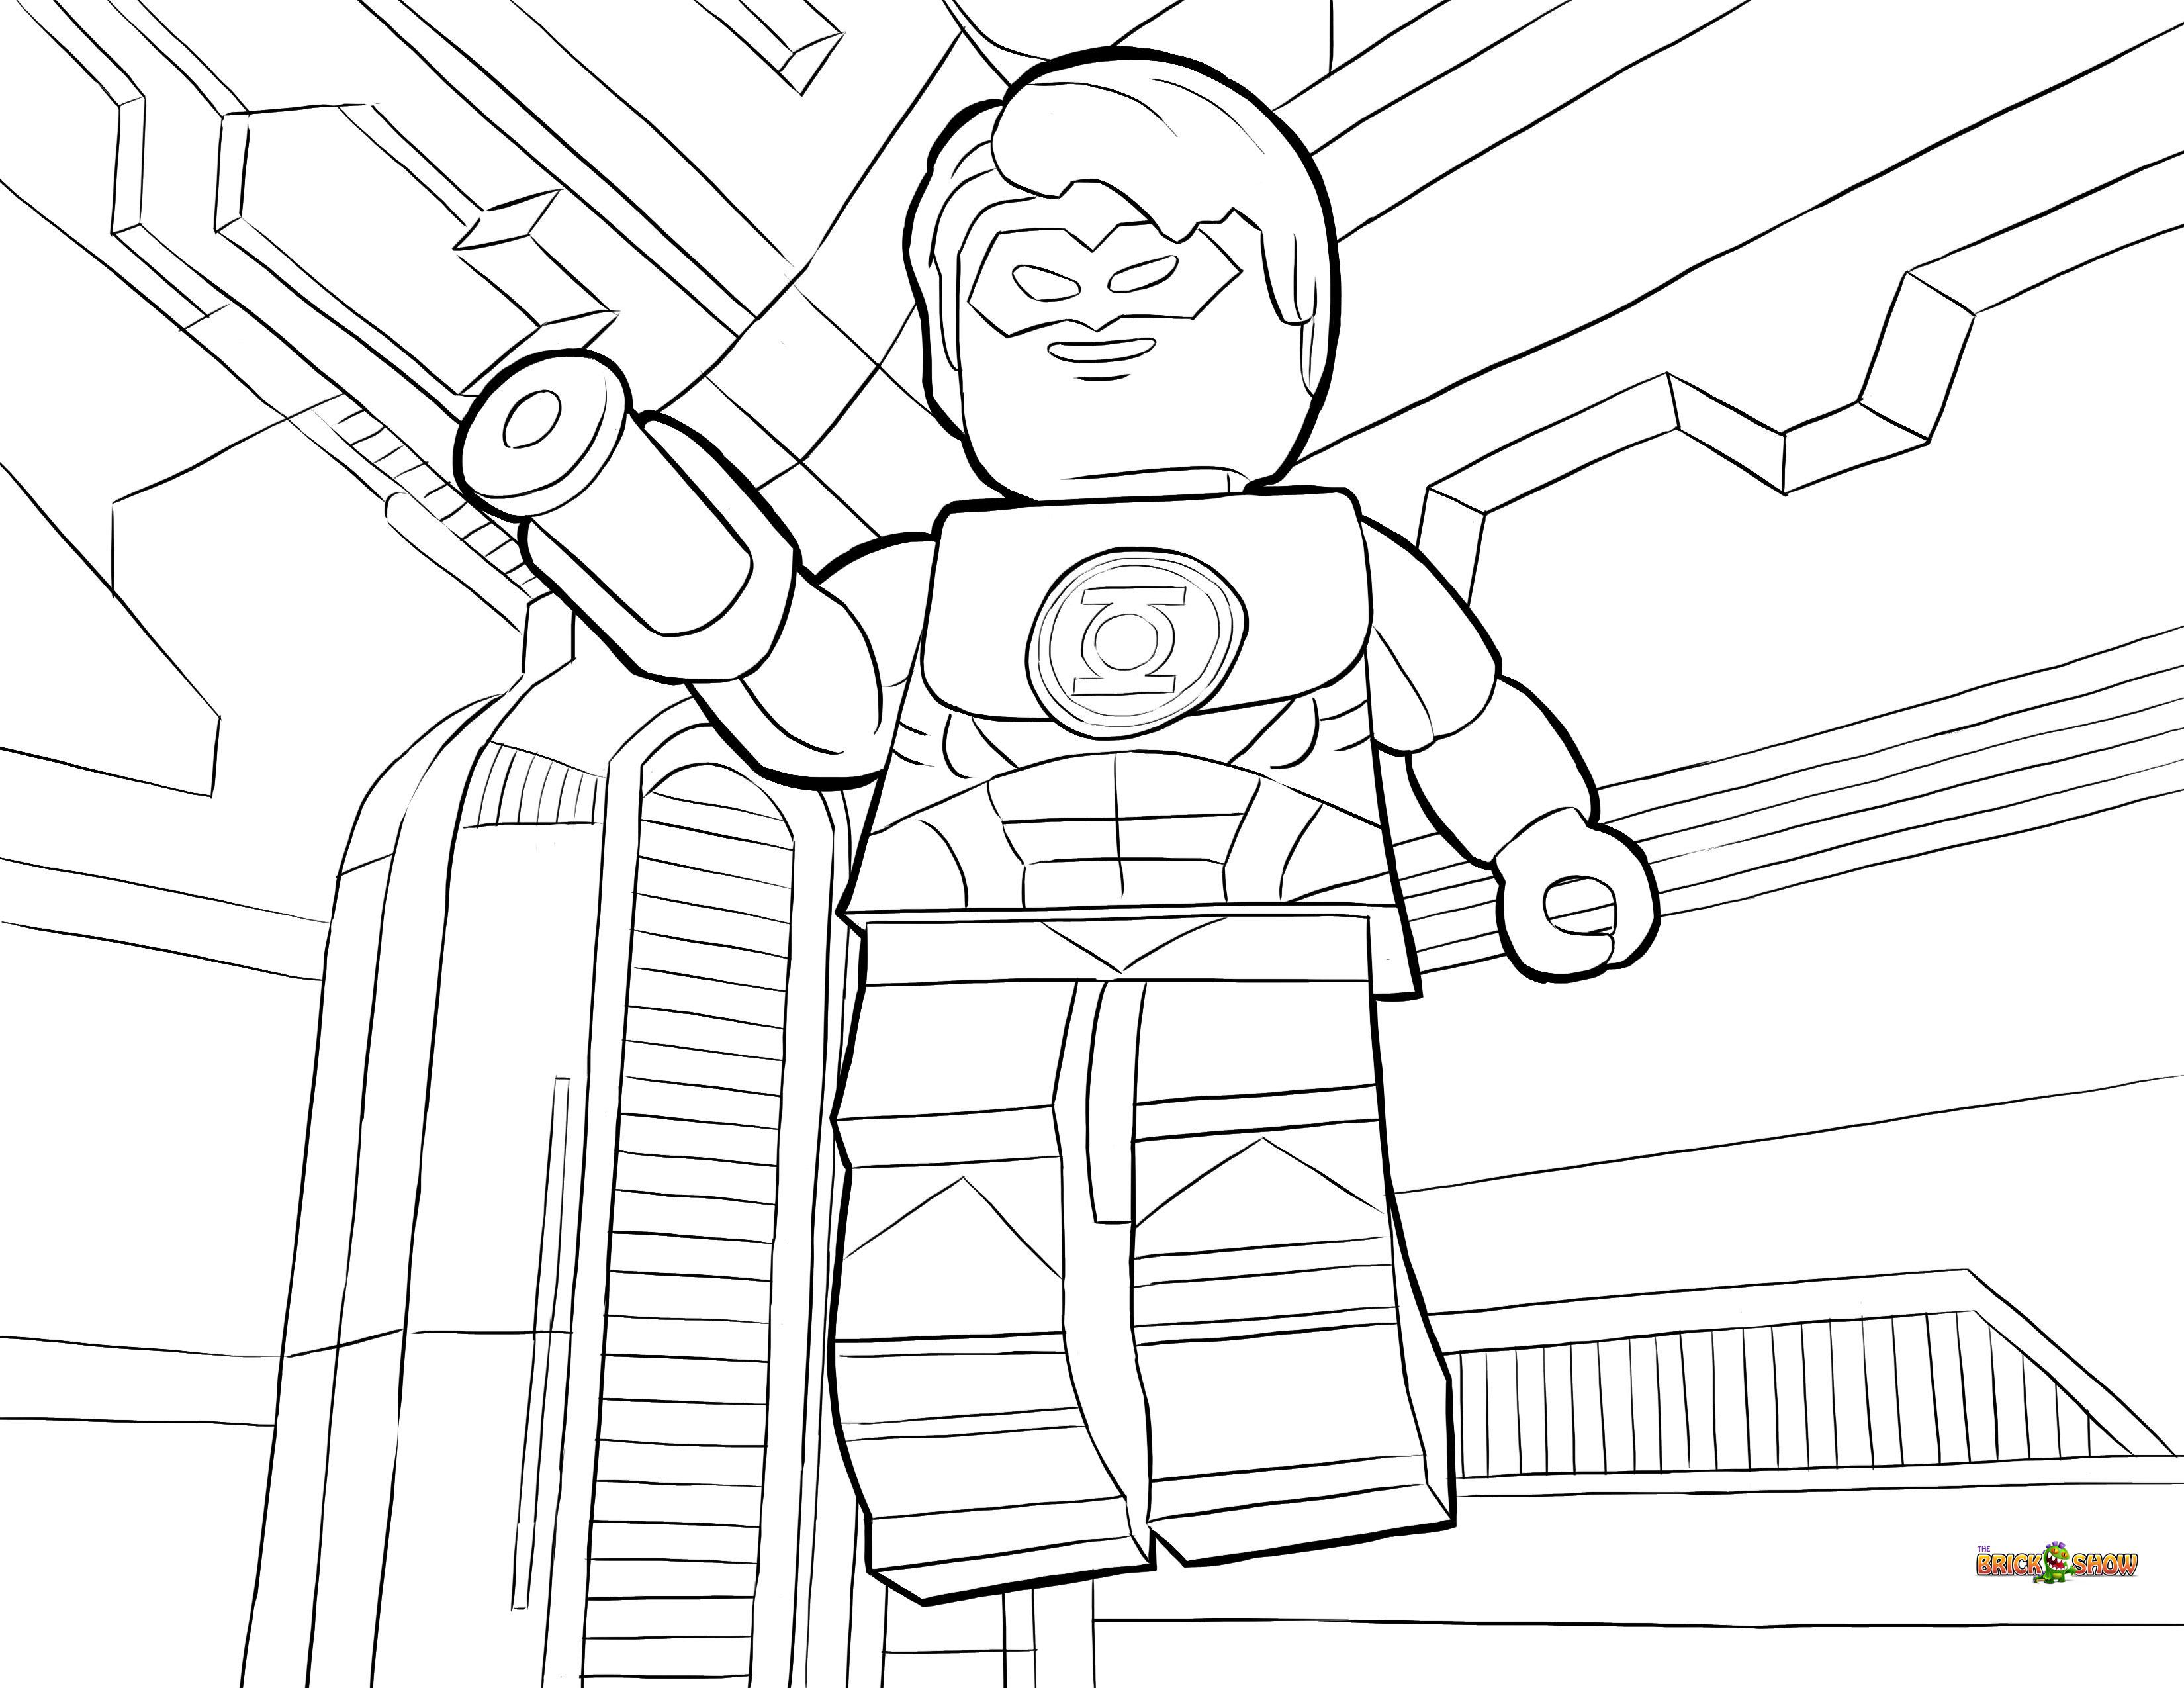 3300x2550 Lego Green Lantern Coloring Page, Printable Sheet